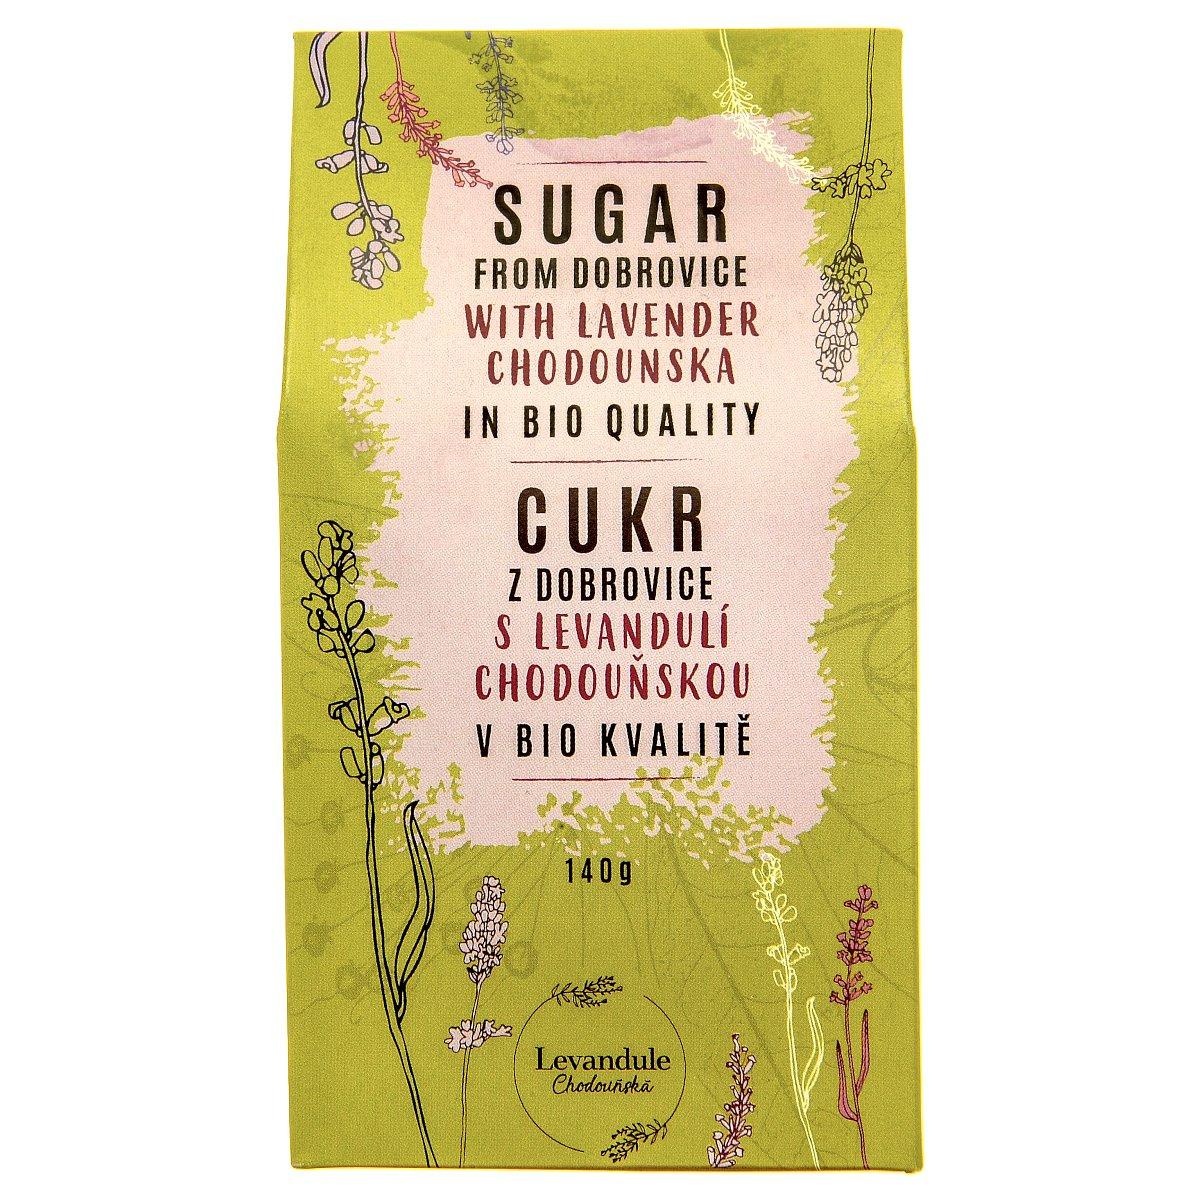 Cukr z Dobrovice s Levandulí Chodouňskou v BIO kvalitě 140g